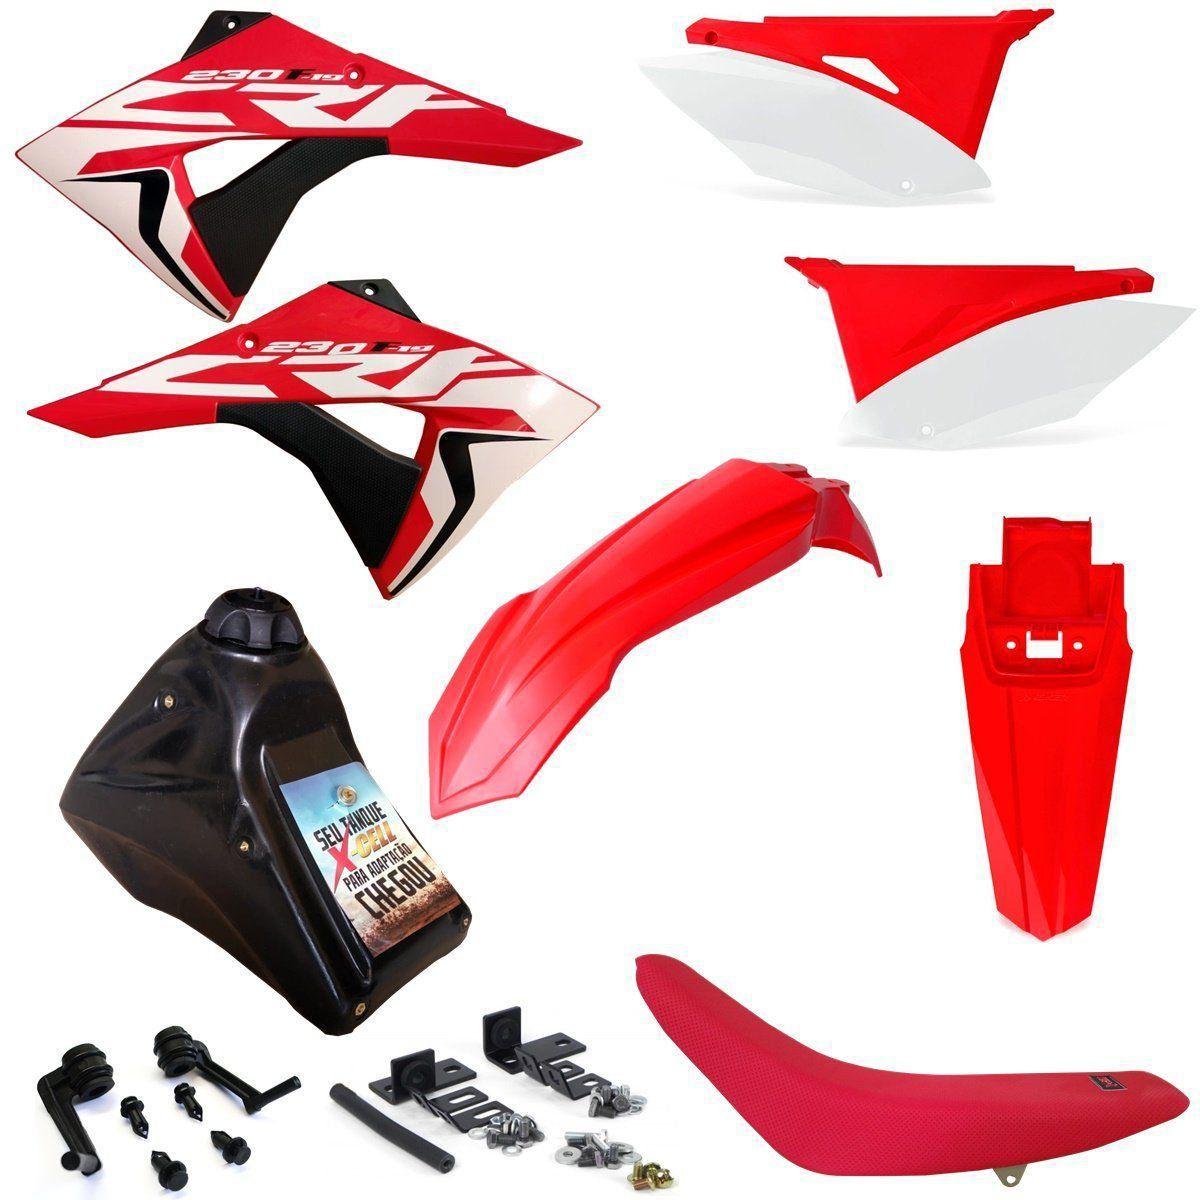 Kit Plástico Biker Elite Completo Crf 230 Adaptável Xr 200 Xr 250 Tornado